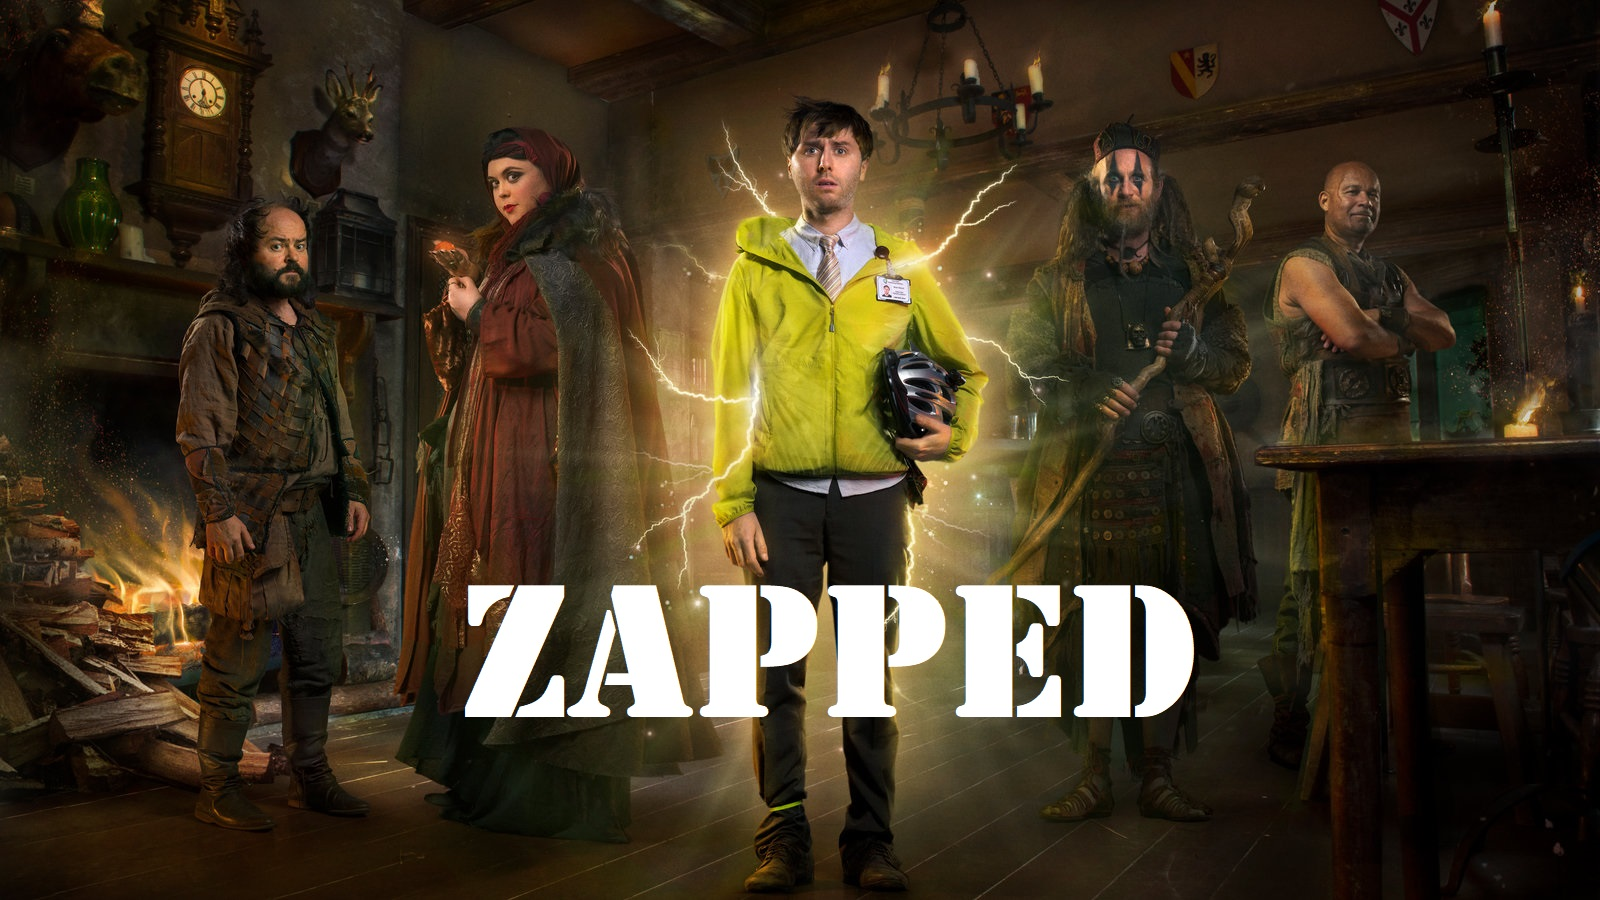 Zapped Season 2 Episode 2